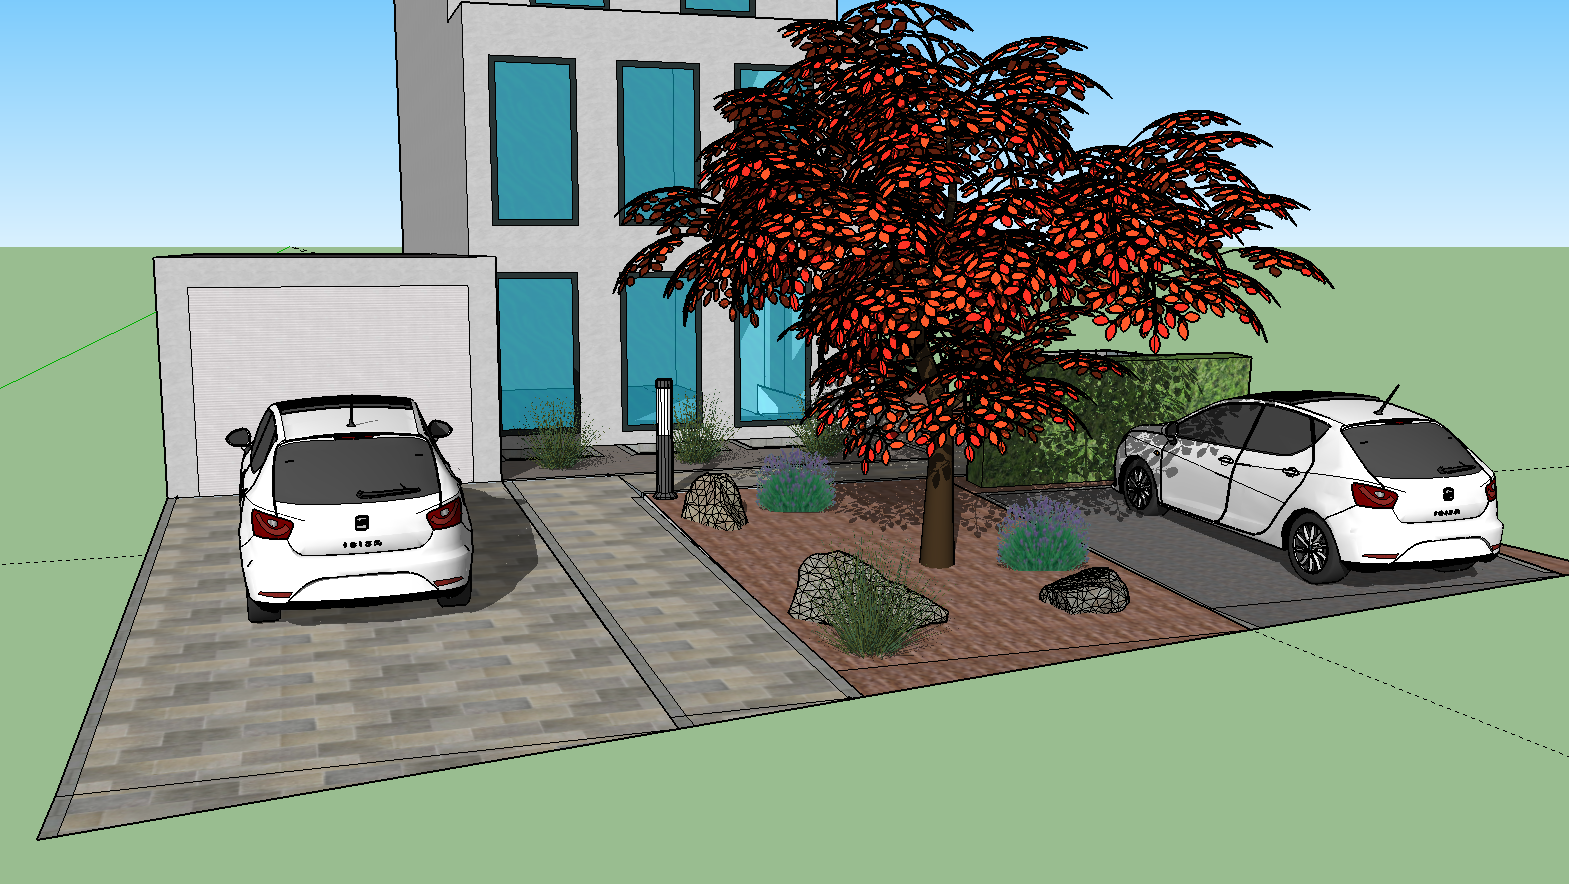 Döring-Gartengestaltung Vorgarten Planung